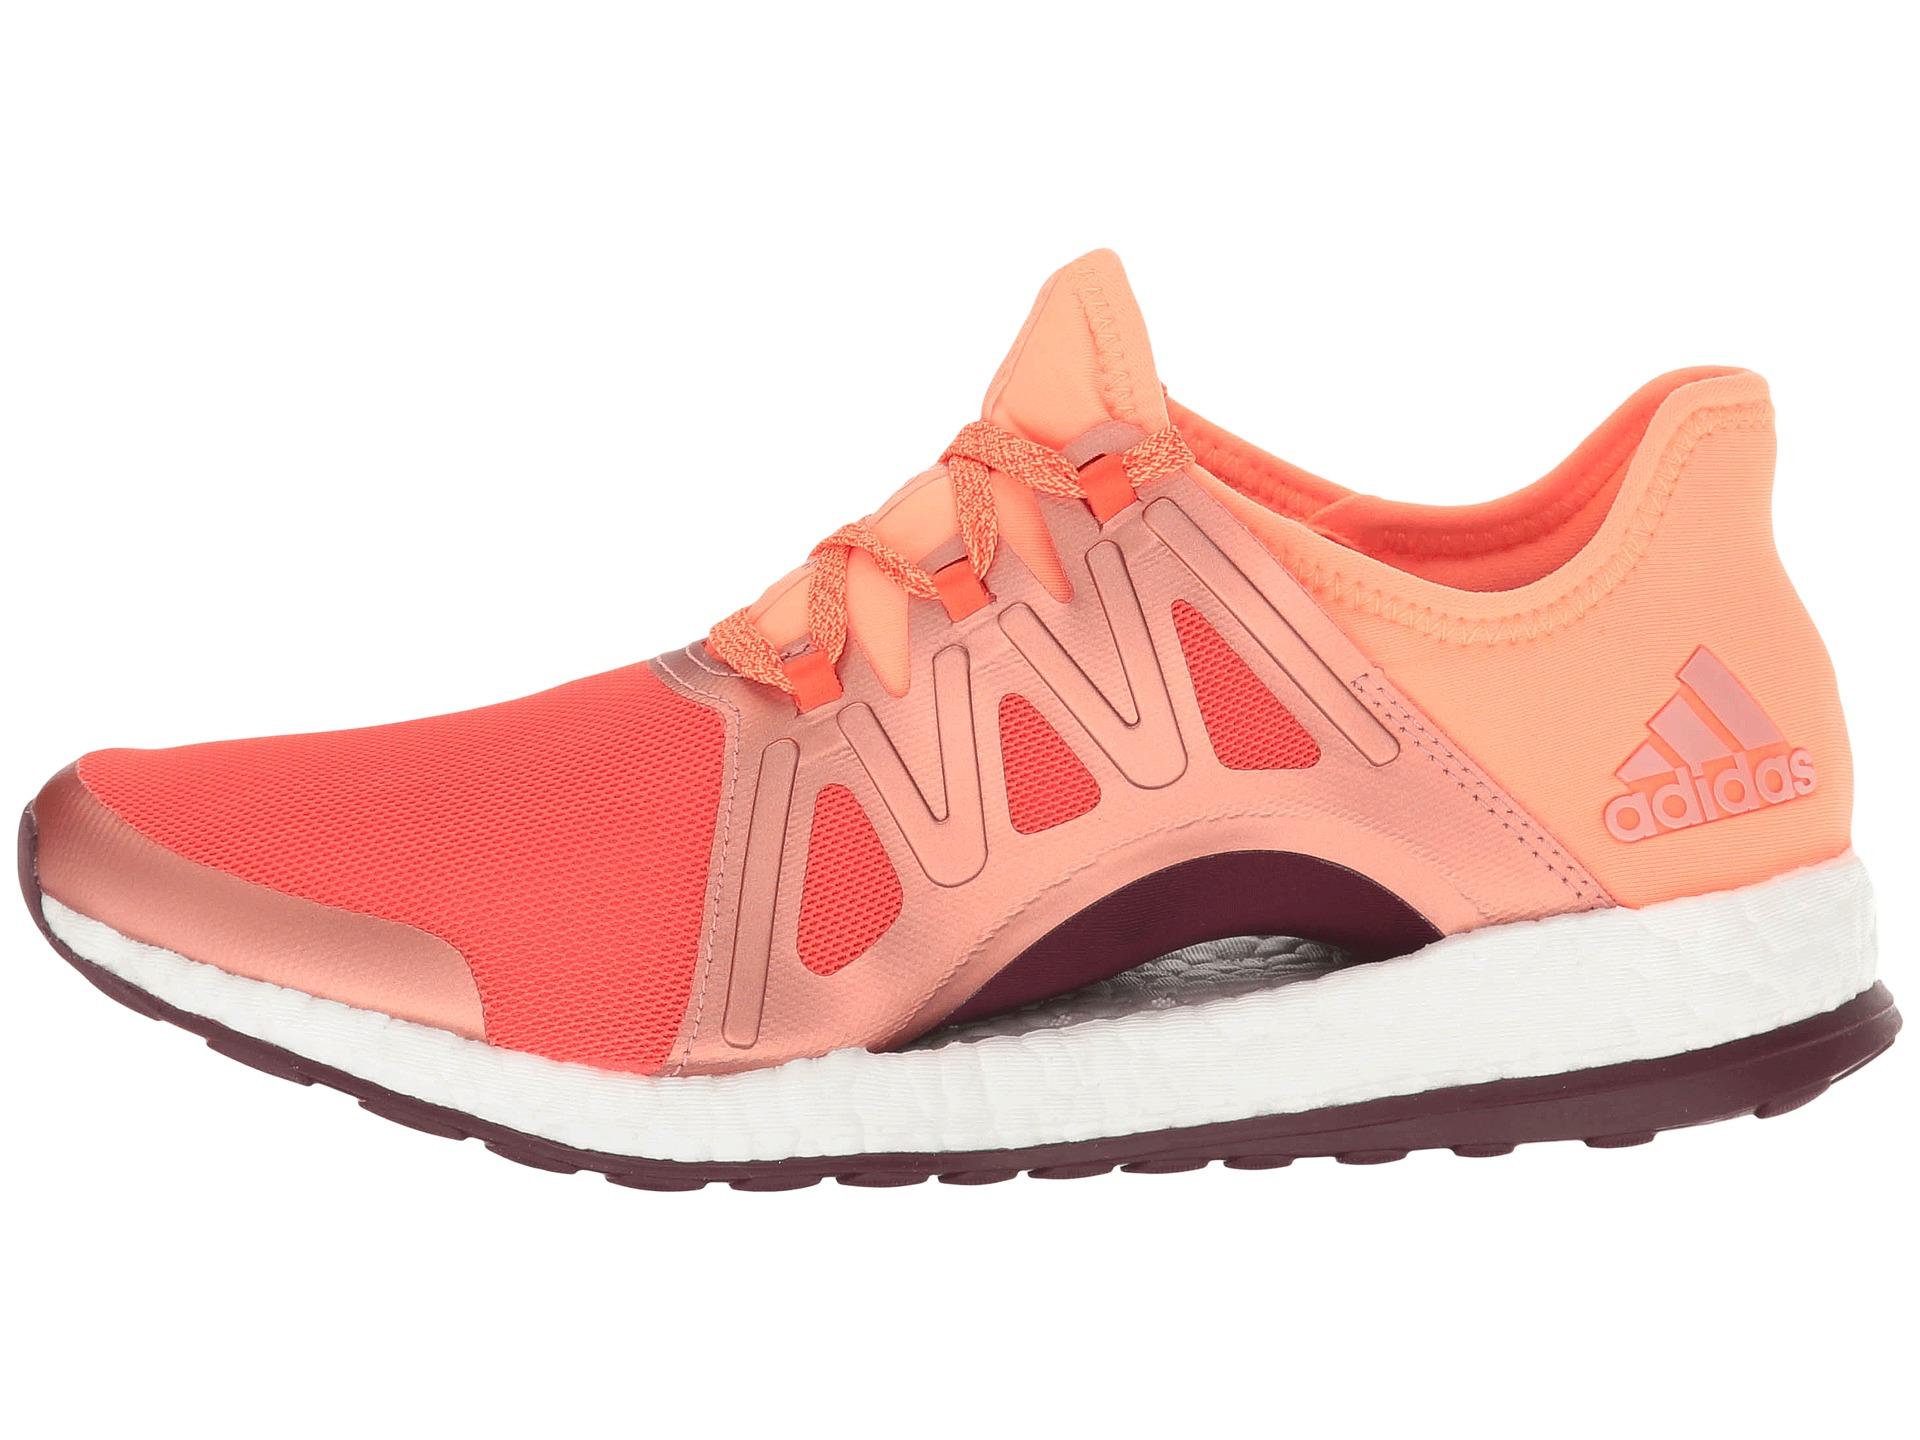 Adidas Supination Running Shoes